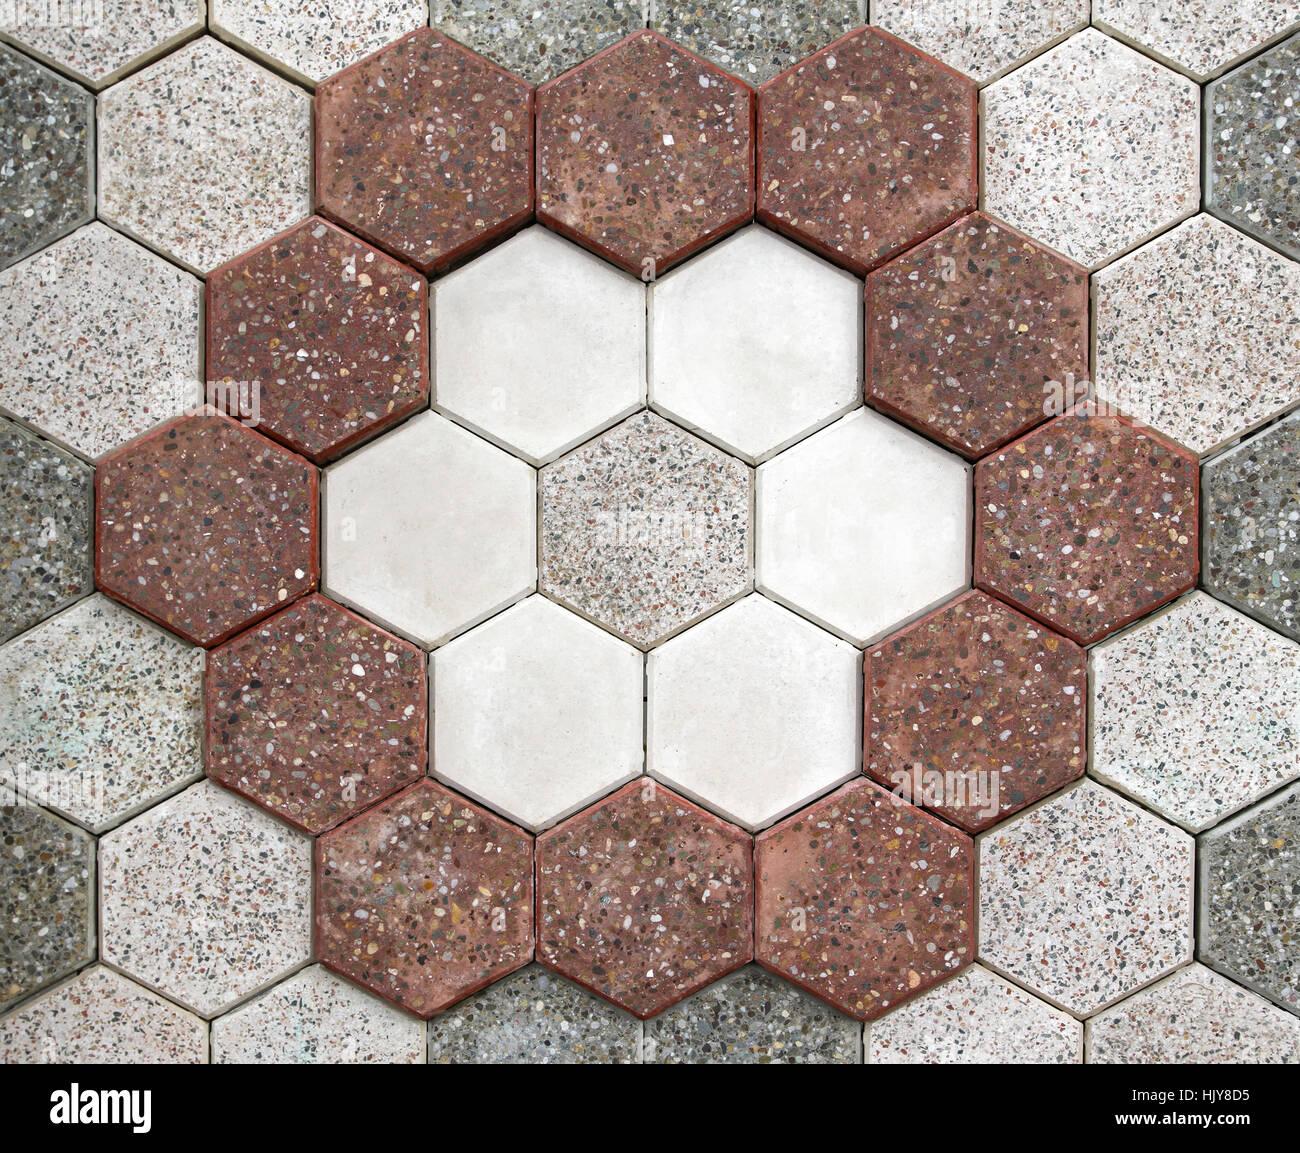 Pflaster, Fliesen, Muster, Mosaik, Mosaik, Ziegel, Steinen, Boden ...